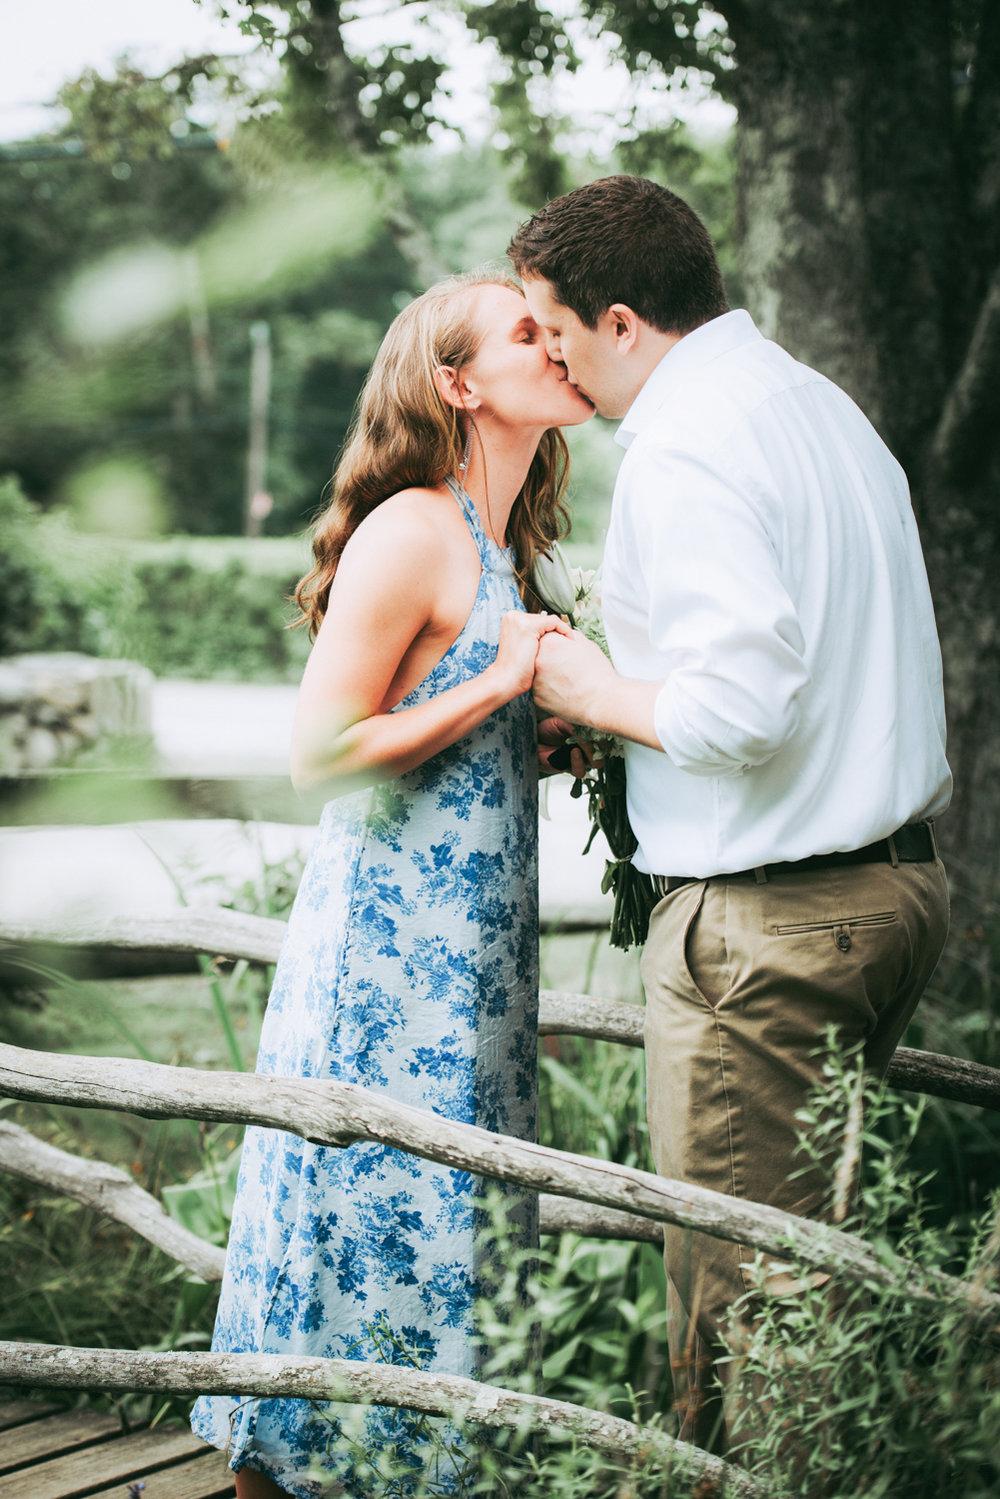 hilary_brian_engagement_kiss_west_tisbury-3617.jpg